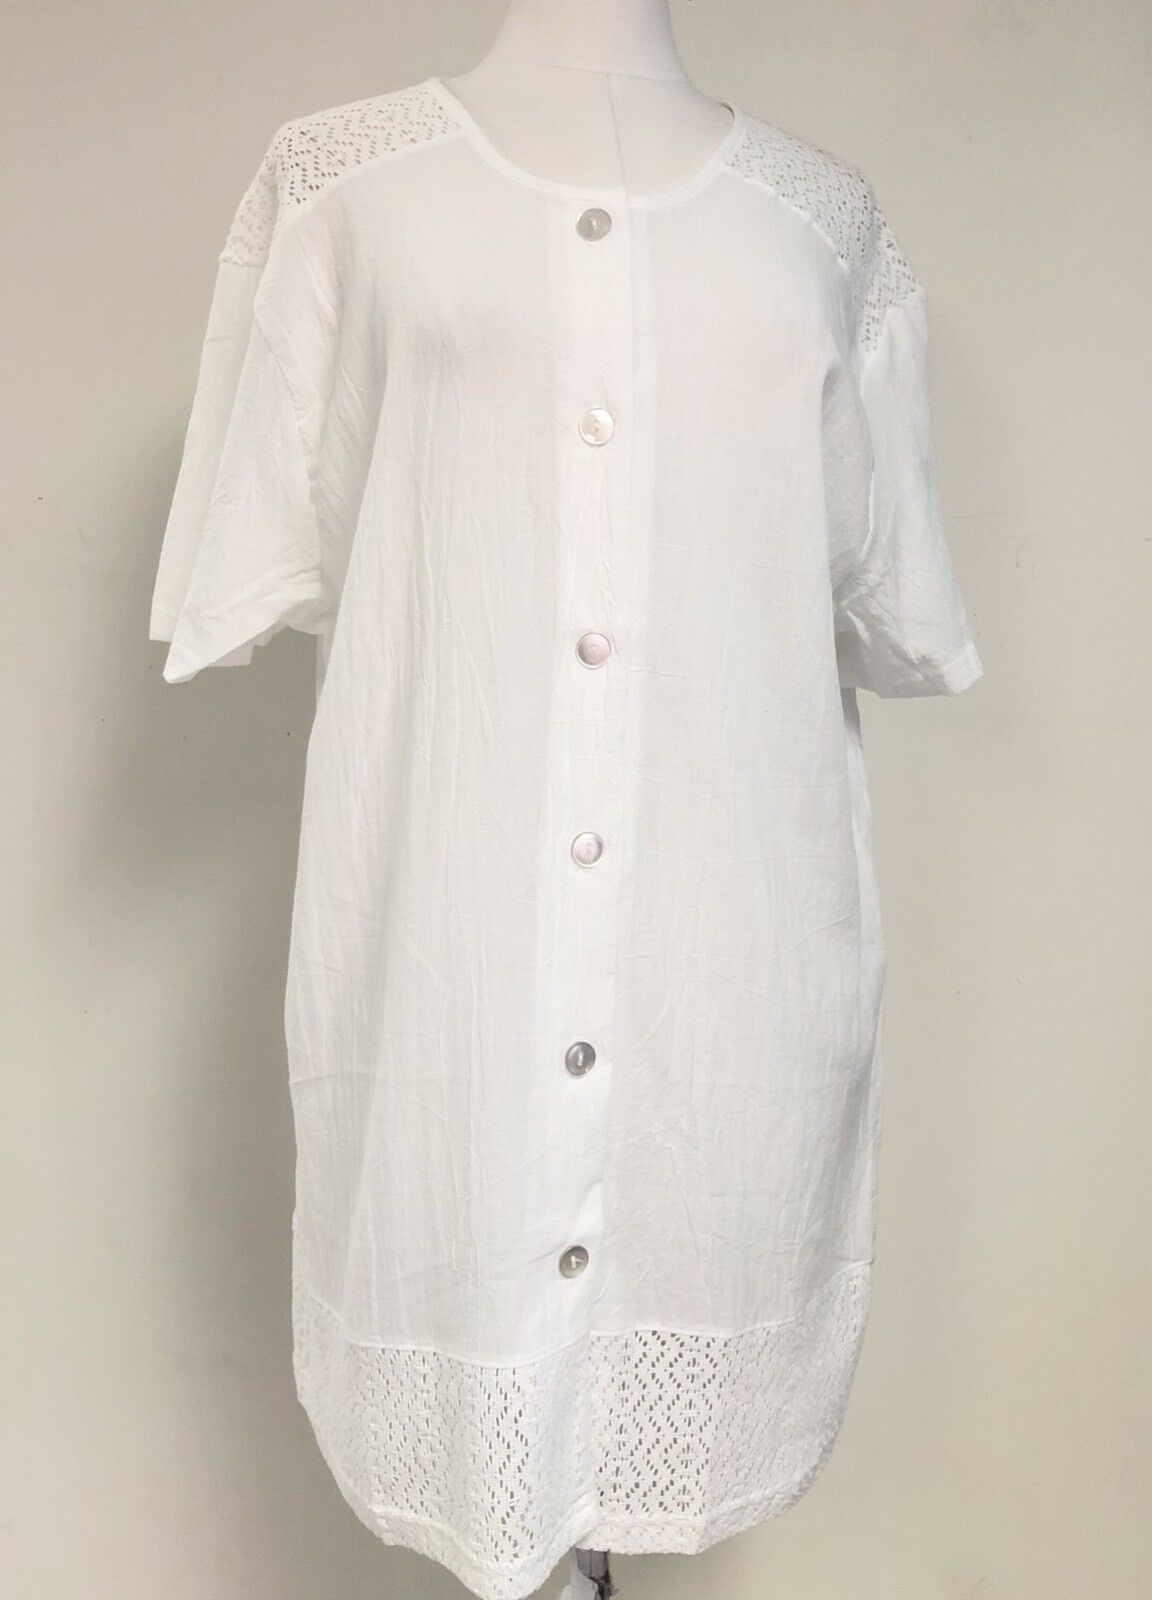 Jordan Taylor Damen Weiß Gehäkelt Knitter Strandbedeckung Bademode Tunika Nwt